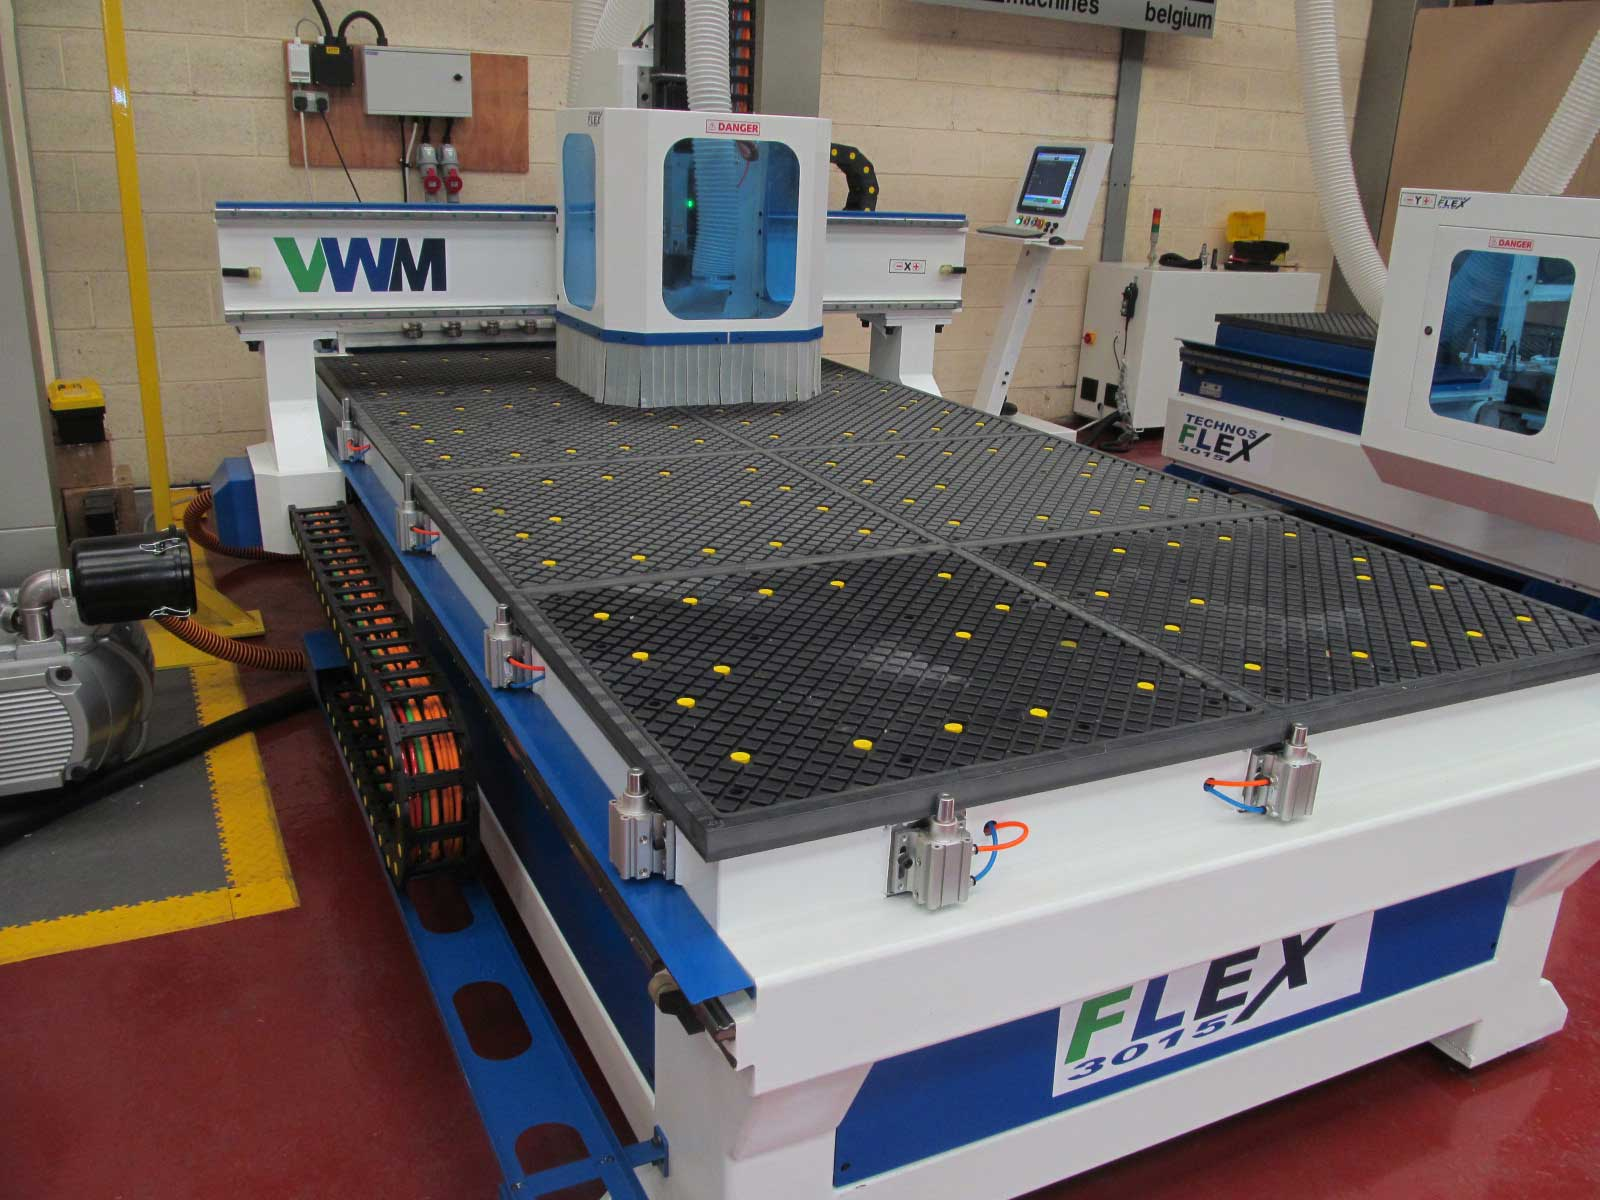 Technos Flexx ECO nesting CNC router